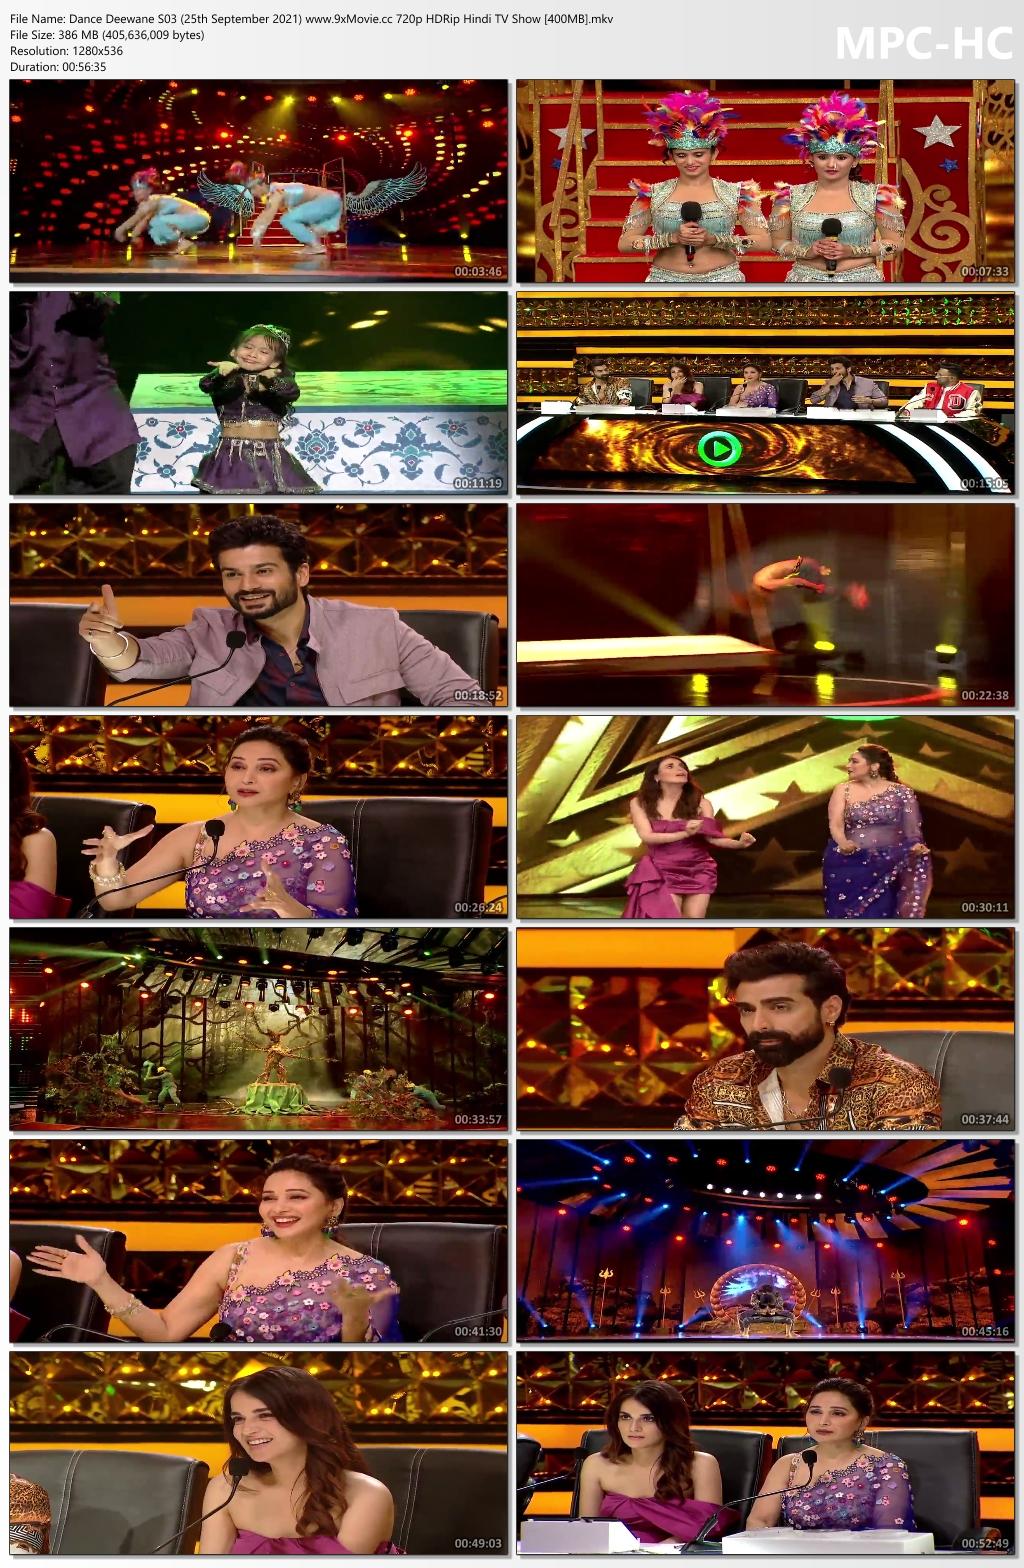 Dance-Deewane-S03-25th-September-2021-www-9x-Movie-cc-720p-HDRip-Hindi-TV-Show-400-MB-mkv